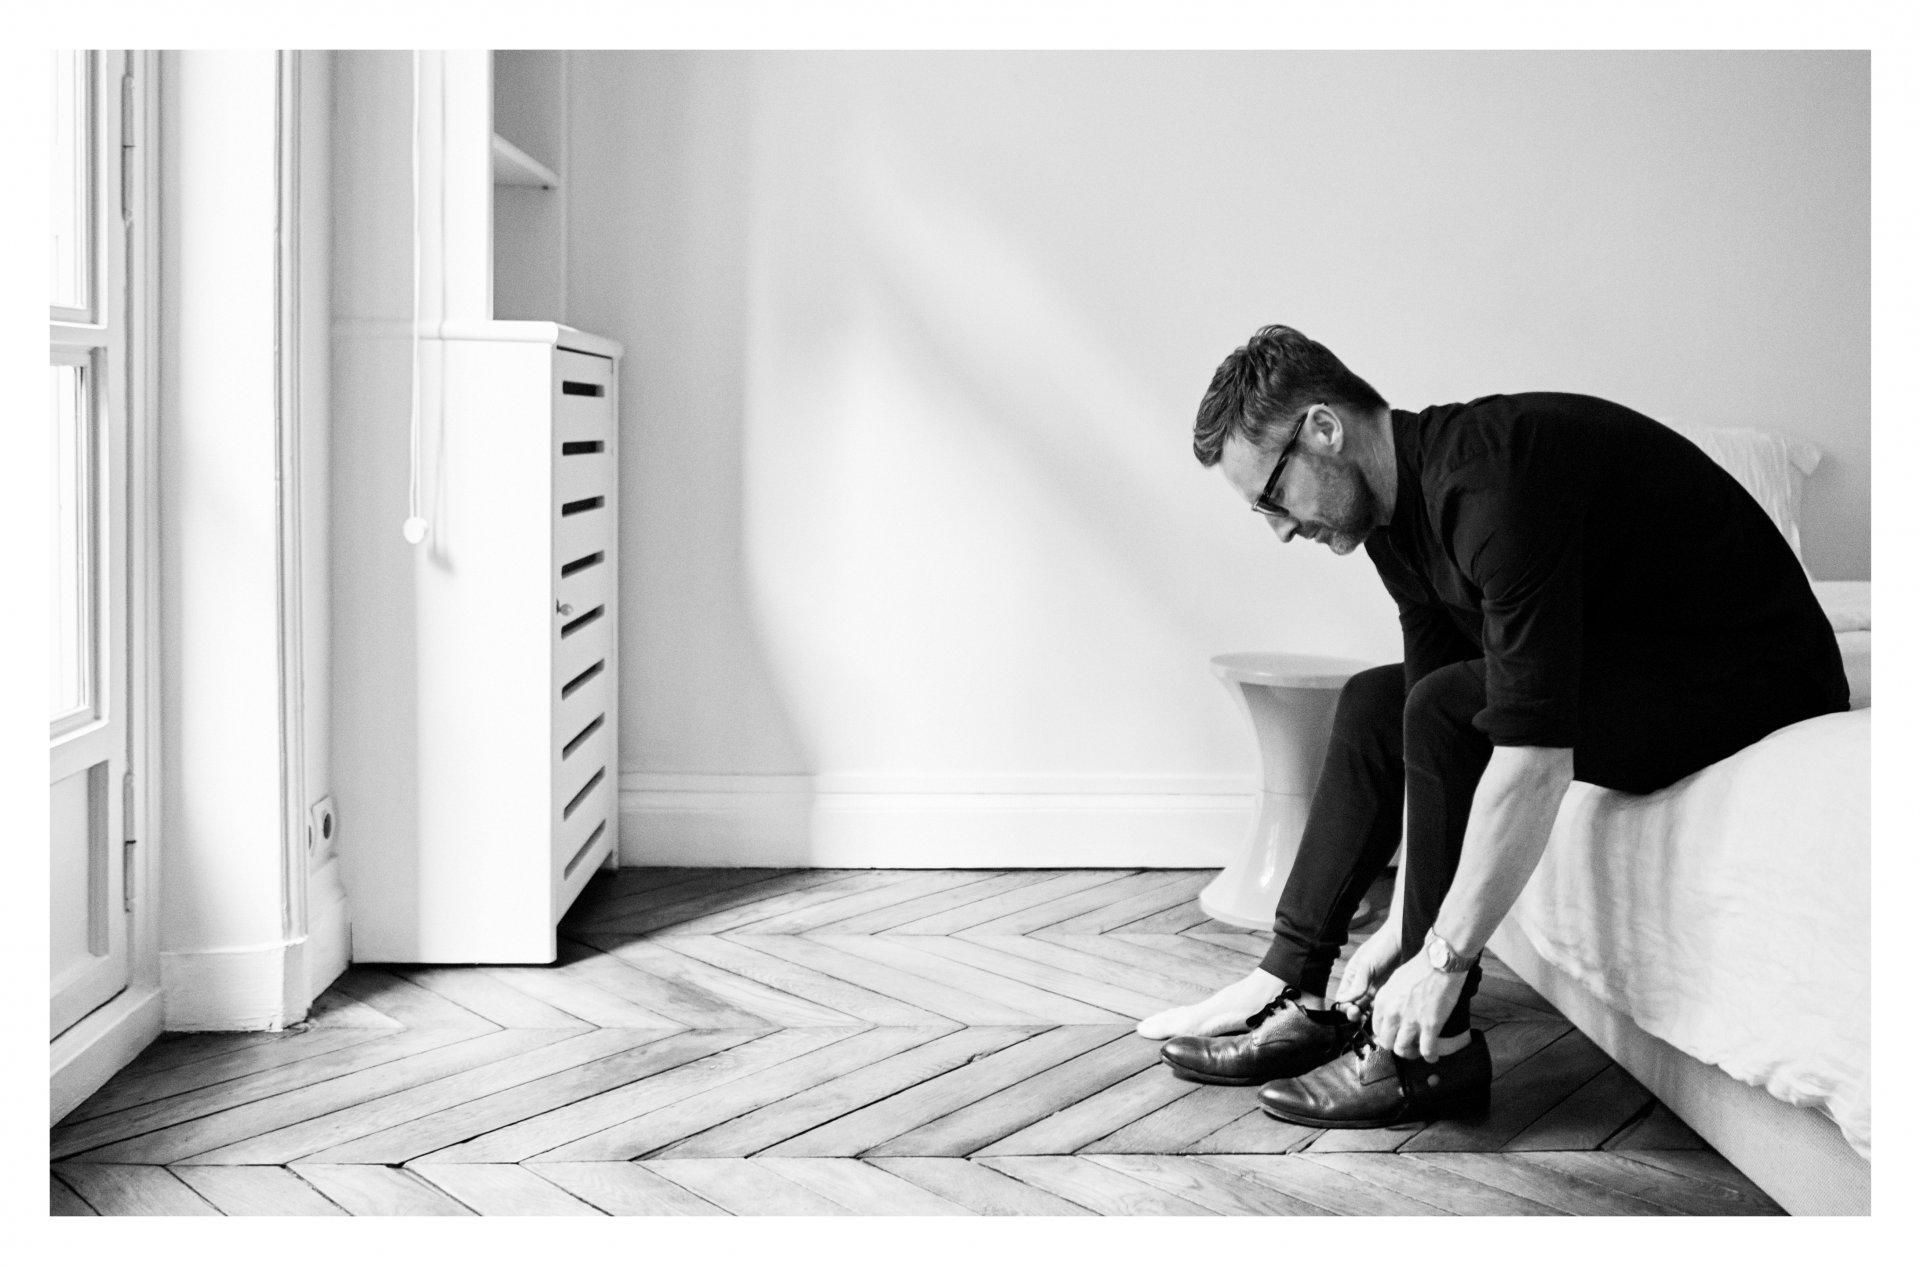 PLAZA MAGAZINE – PETER SIMONSSON STUDIO MAGNUS KLACKENSTAM